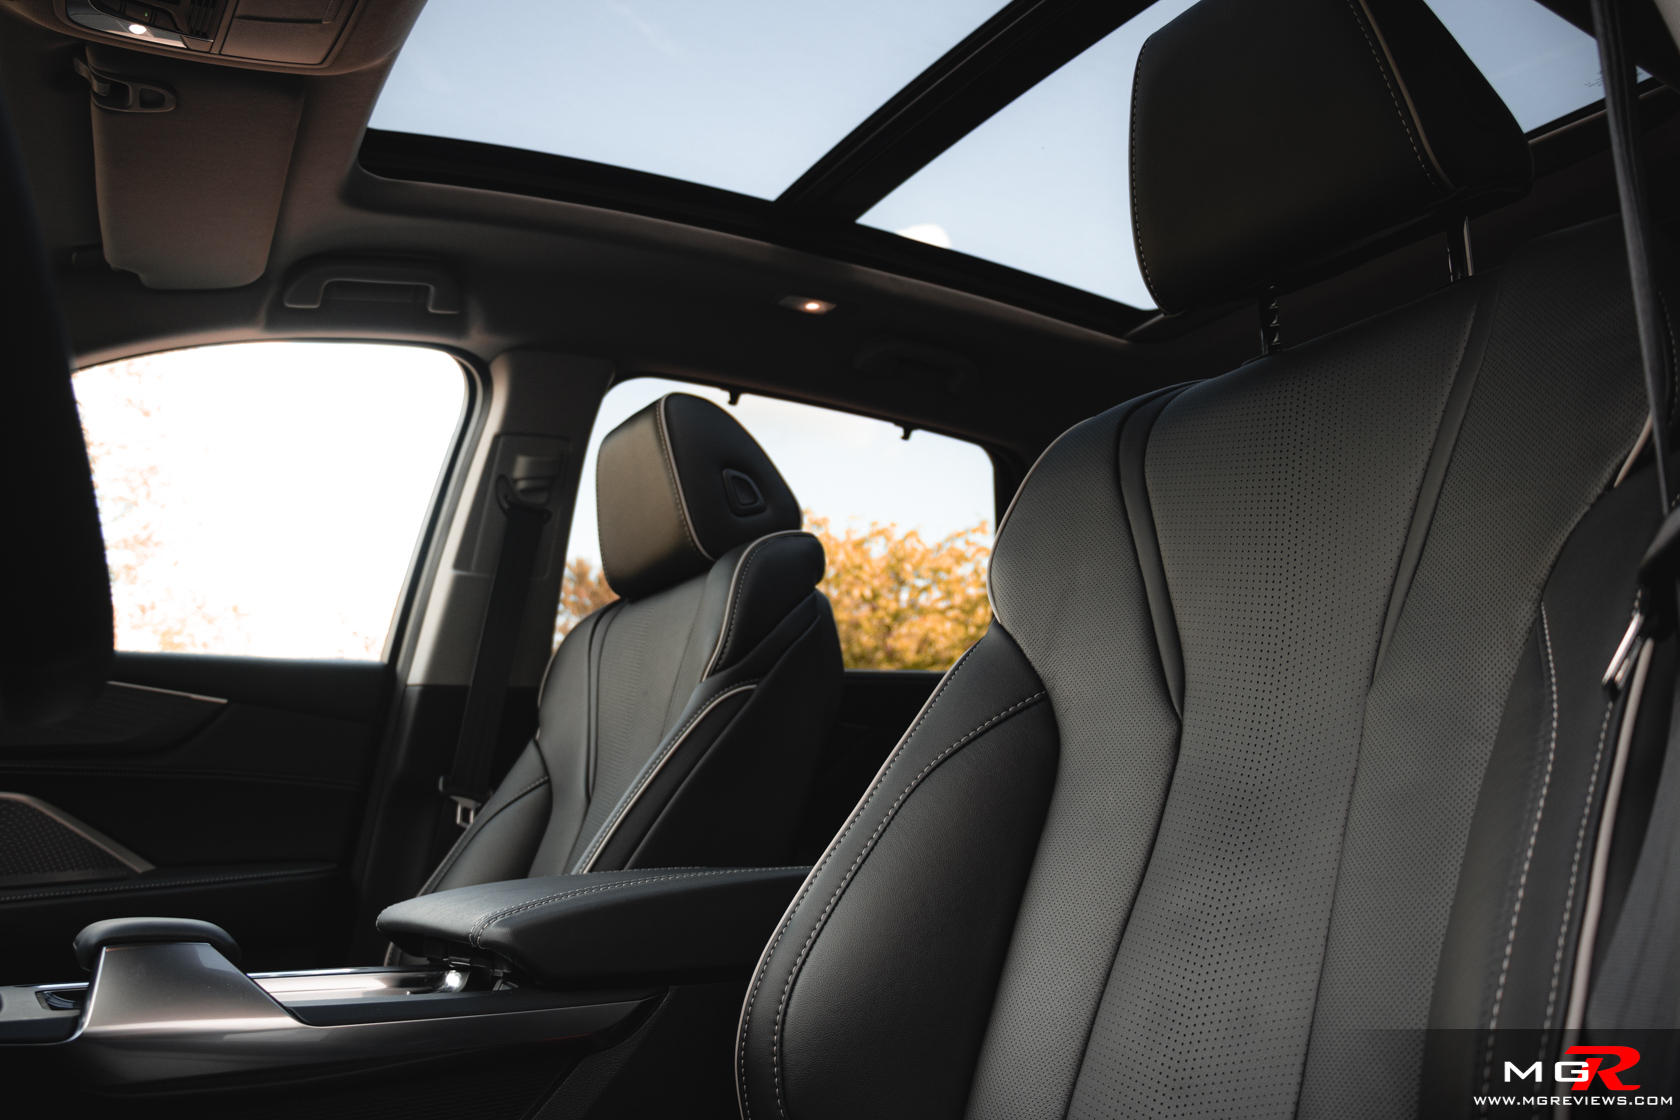 2022 Acura MDX Interior